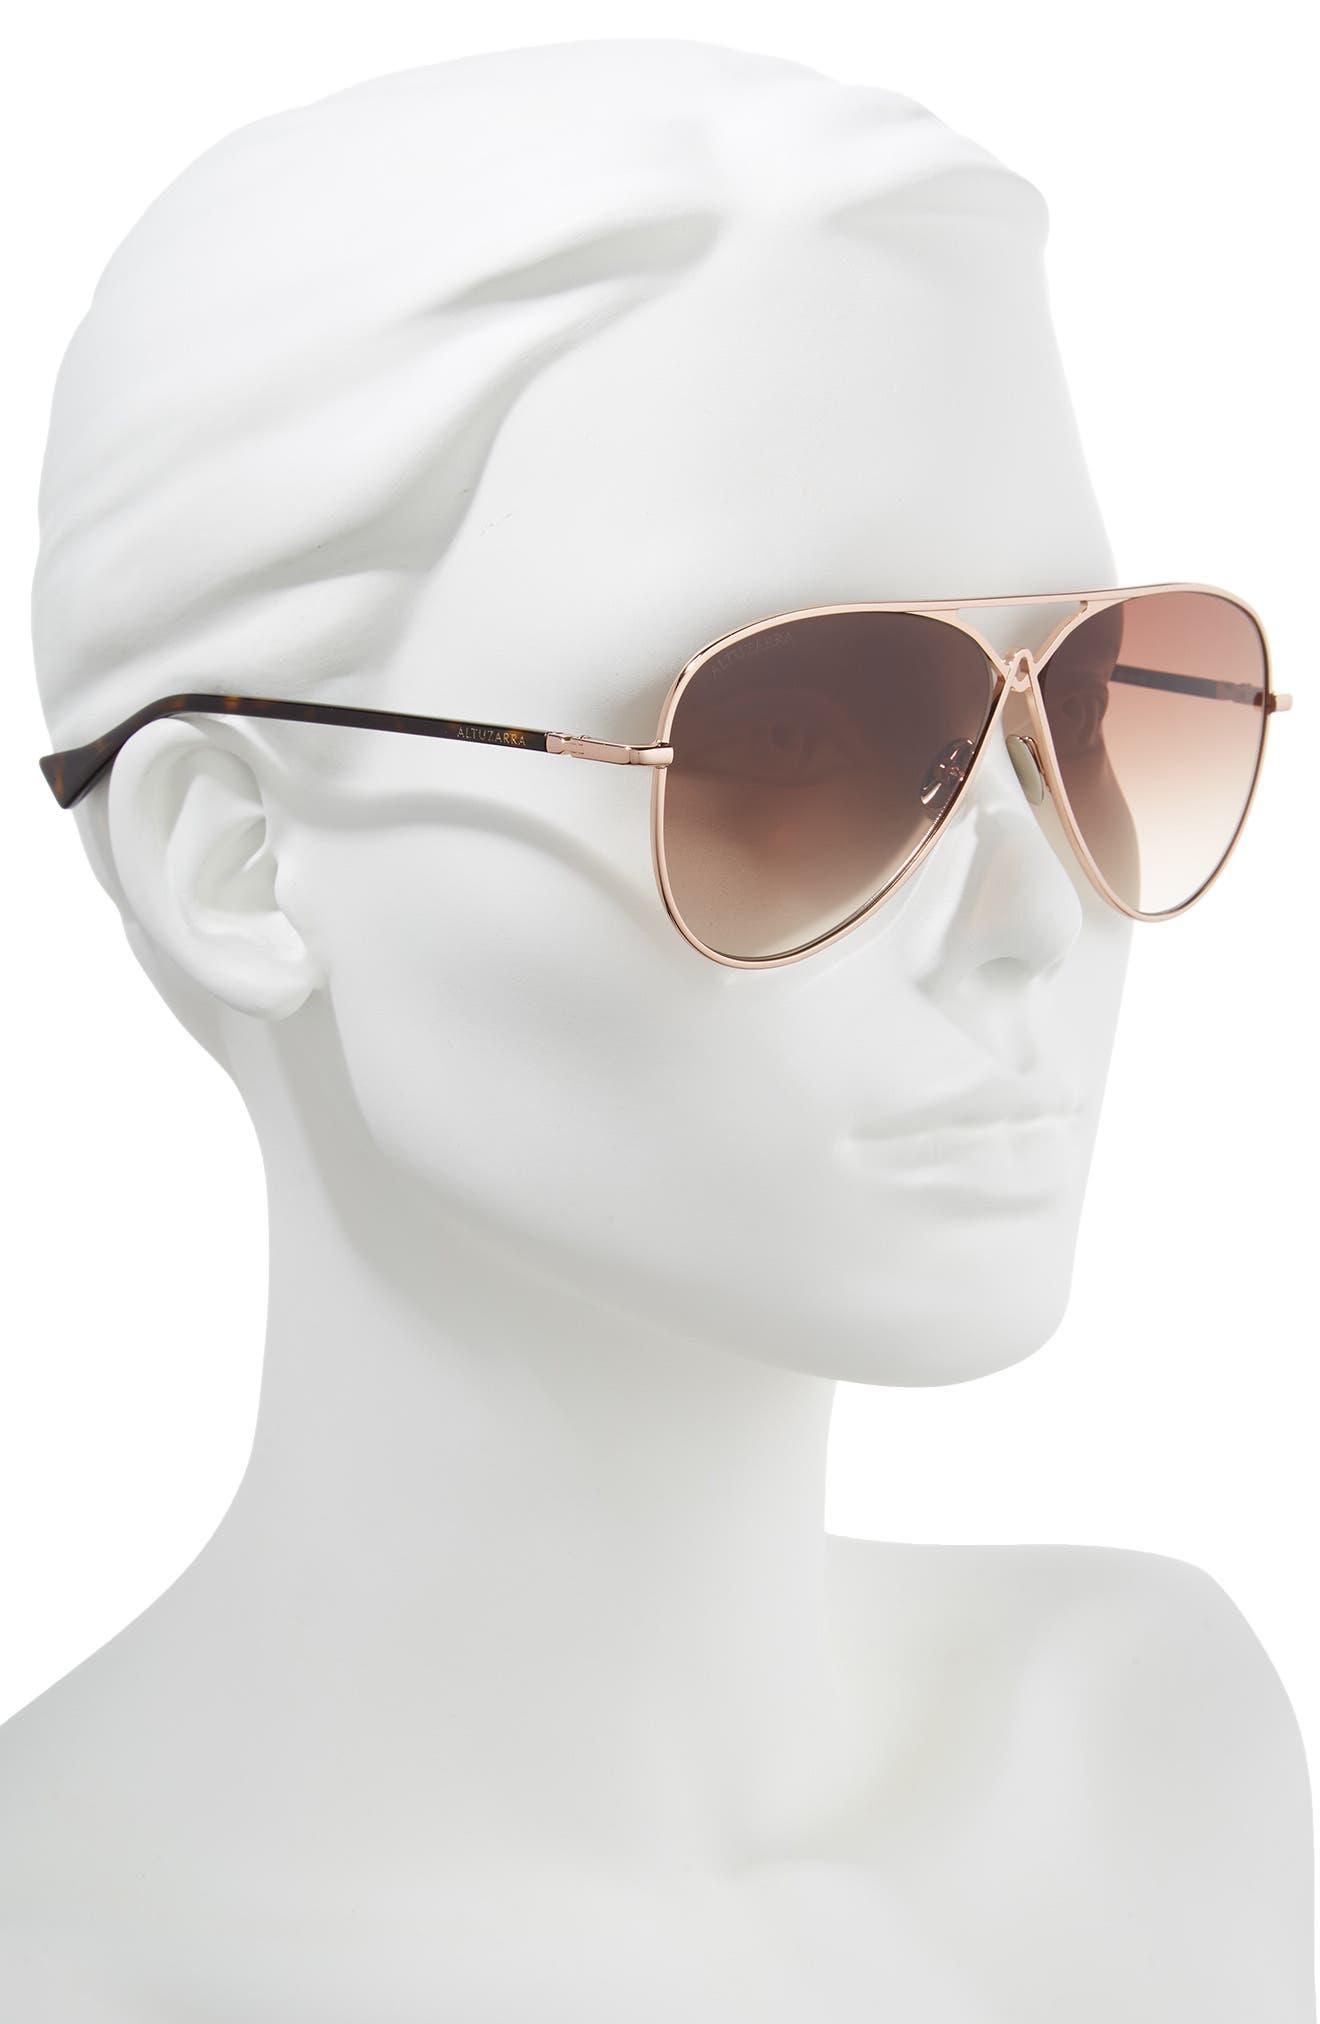 60mm Metal Aviator Sunglasses,                             Alternate thumbnail 2, color,                             ROSE GOLD